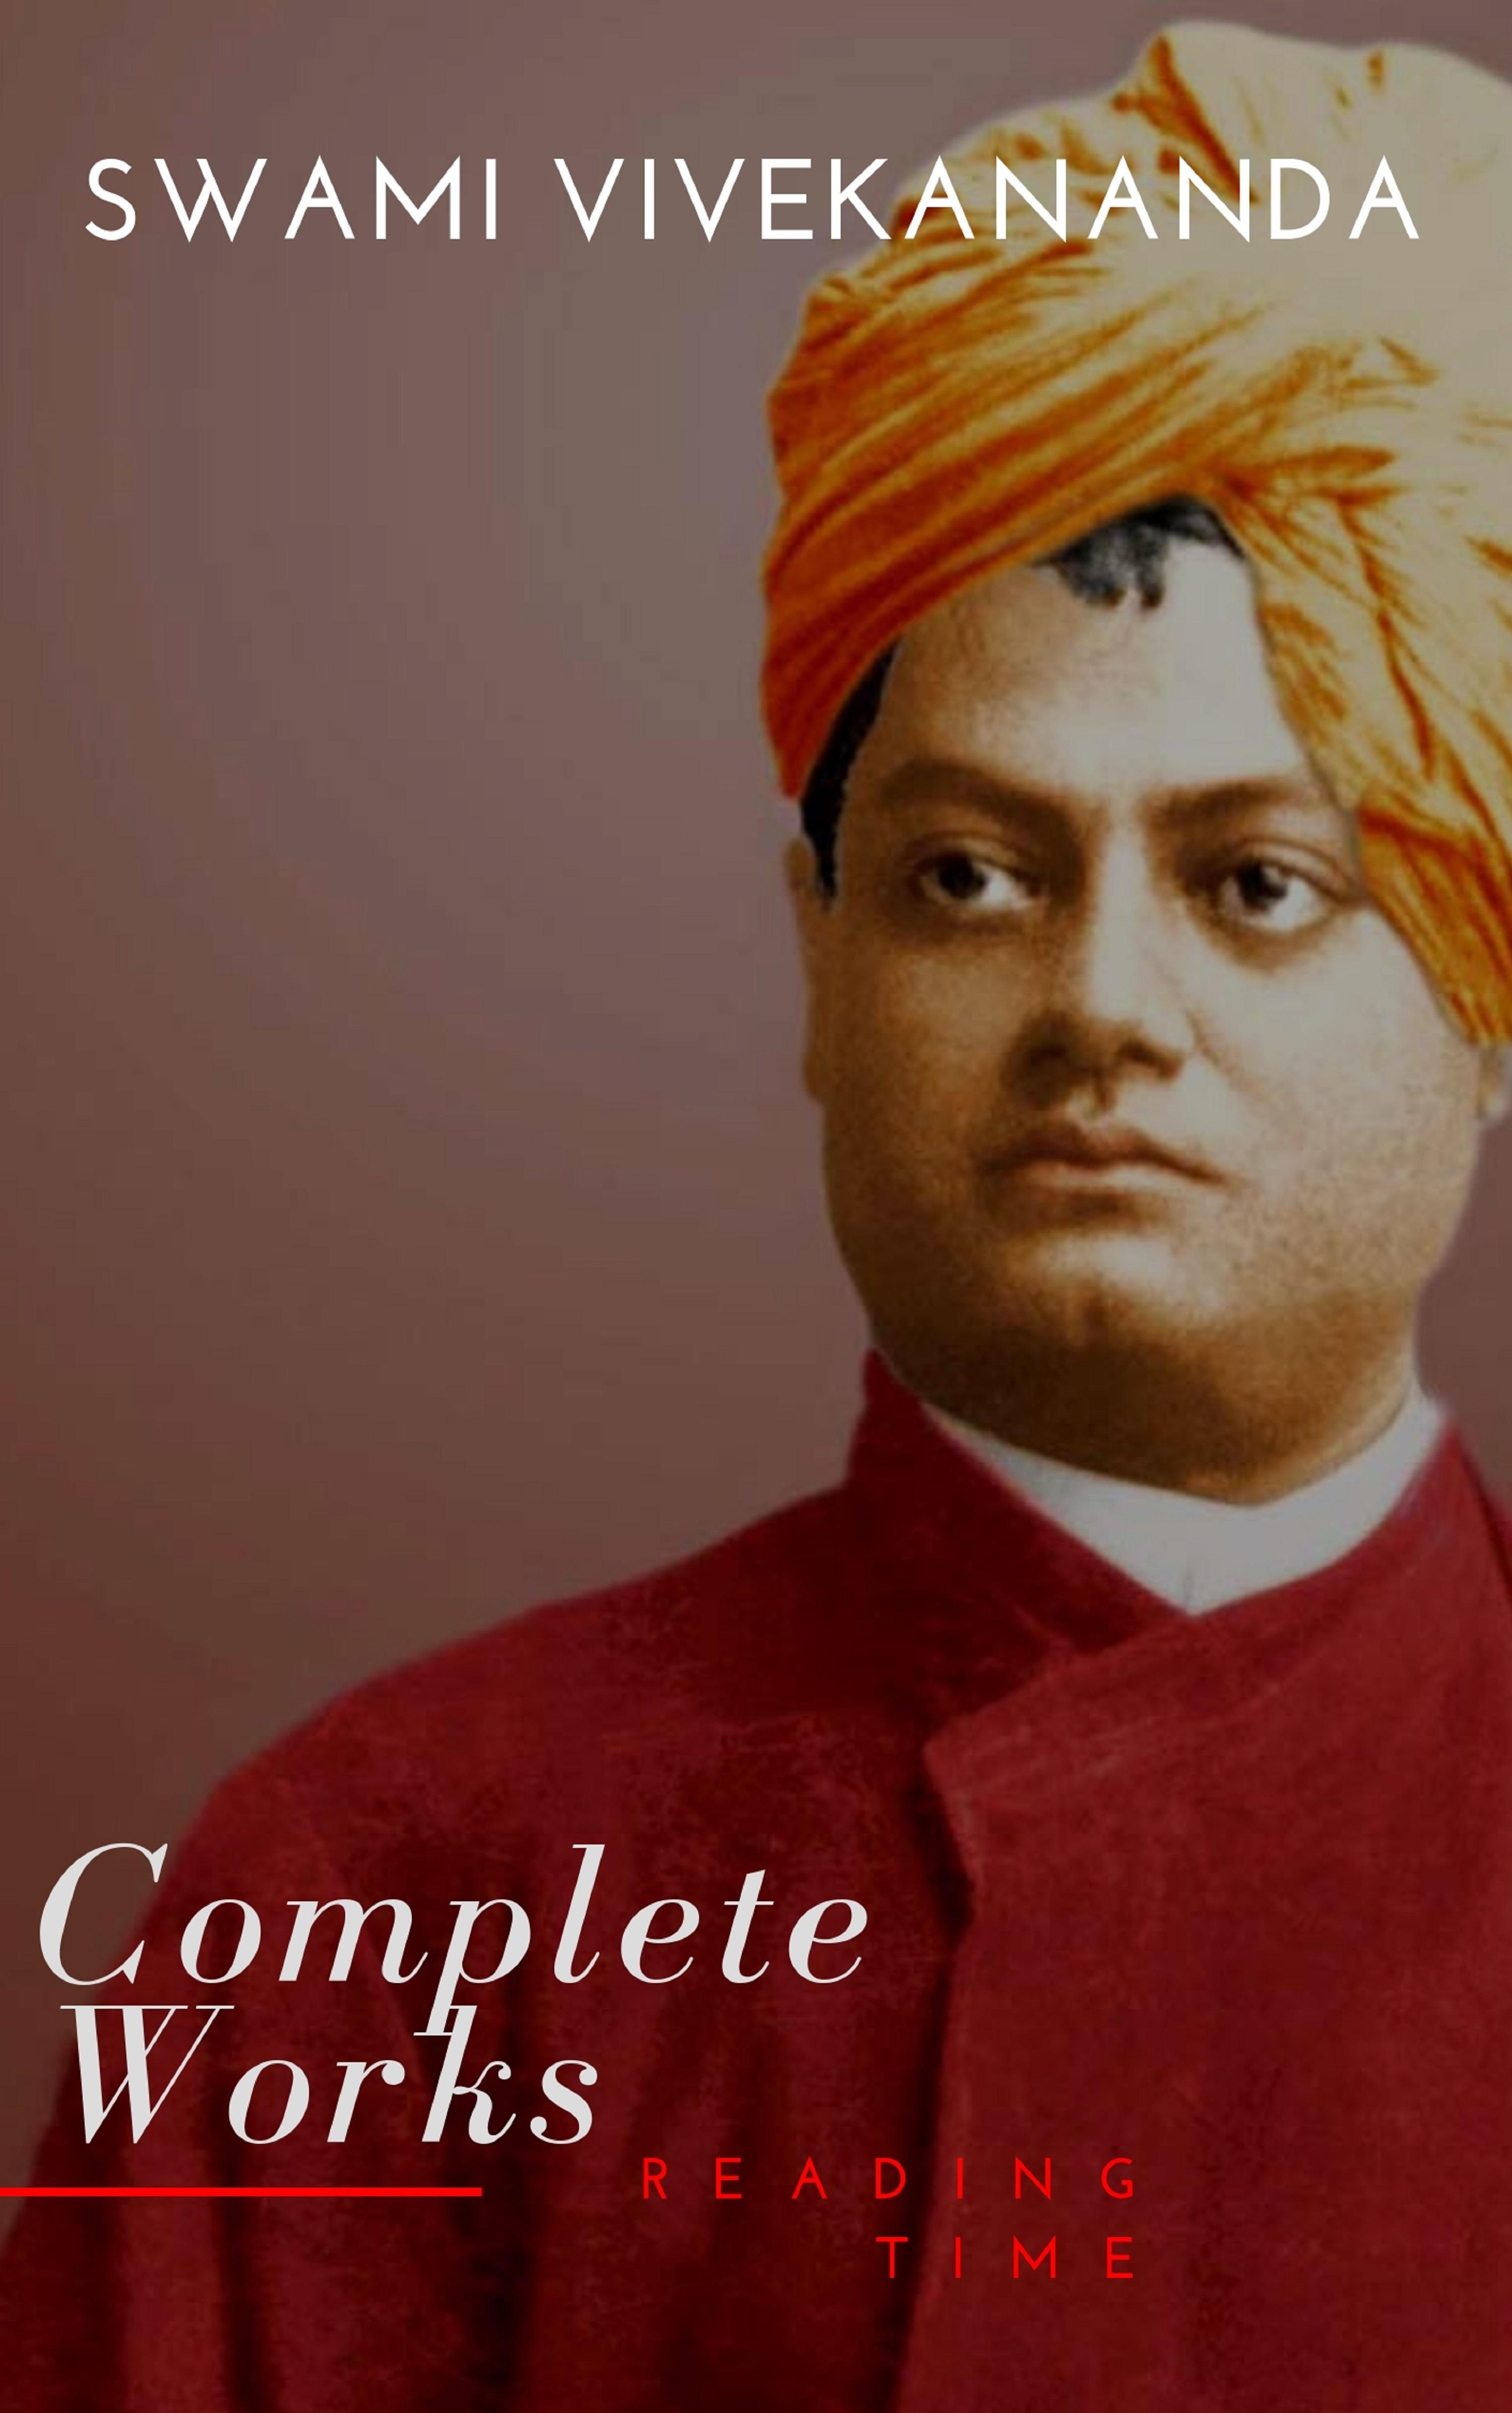 Complete Works of Swami Vivekananda фото